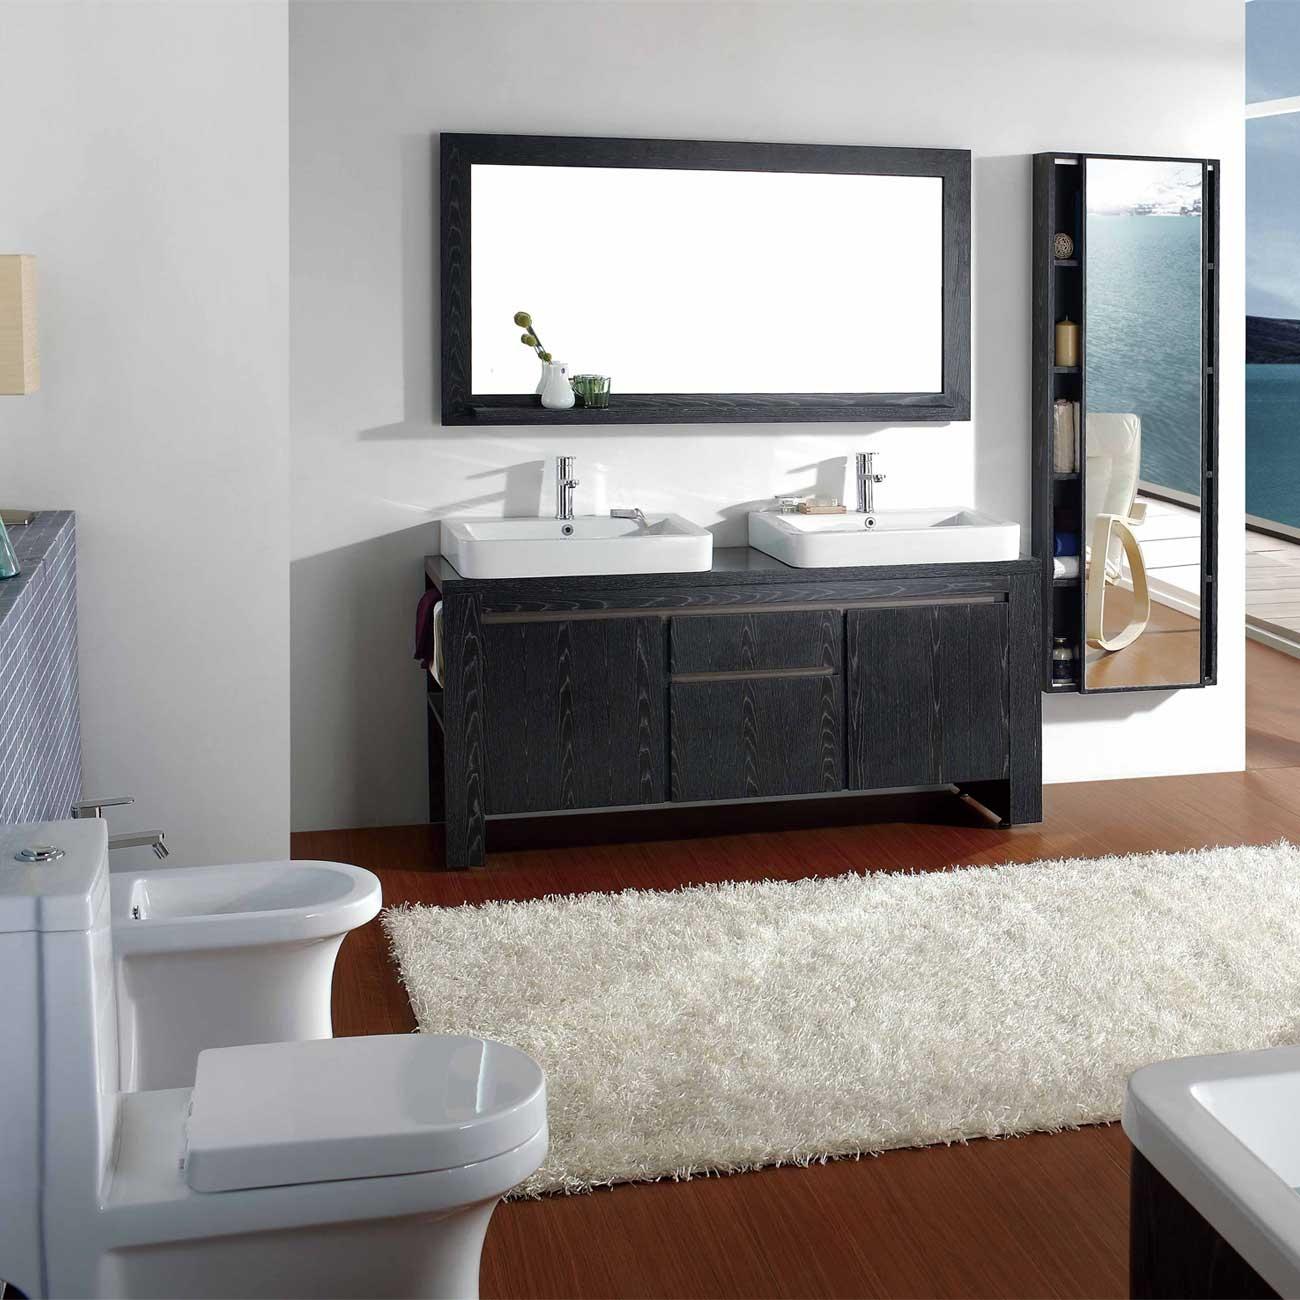 Pictures Of Bathroom Vanity Mirrors